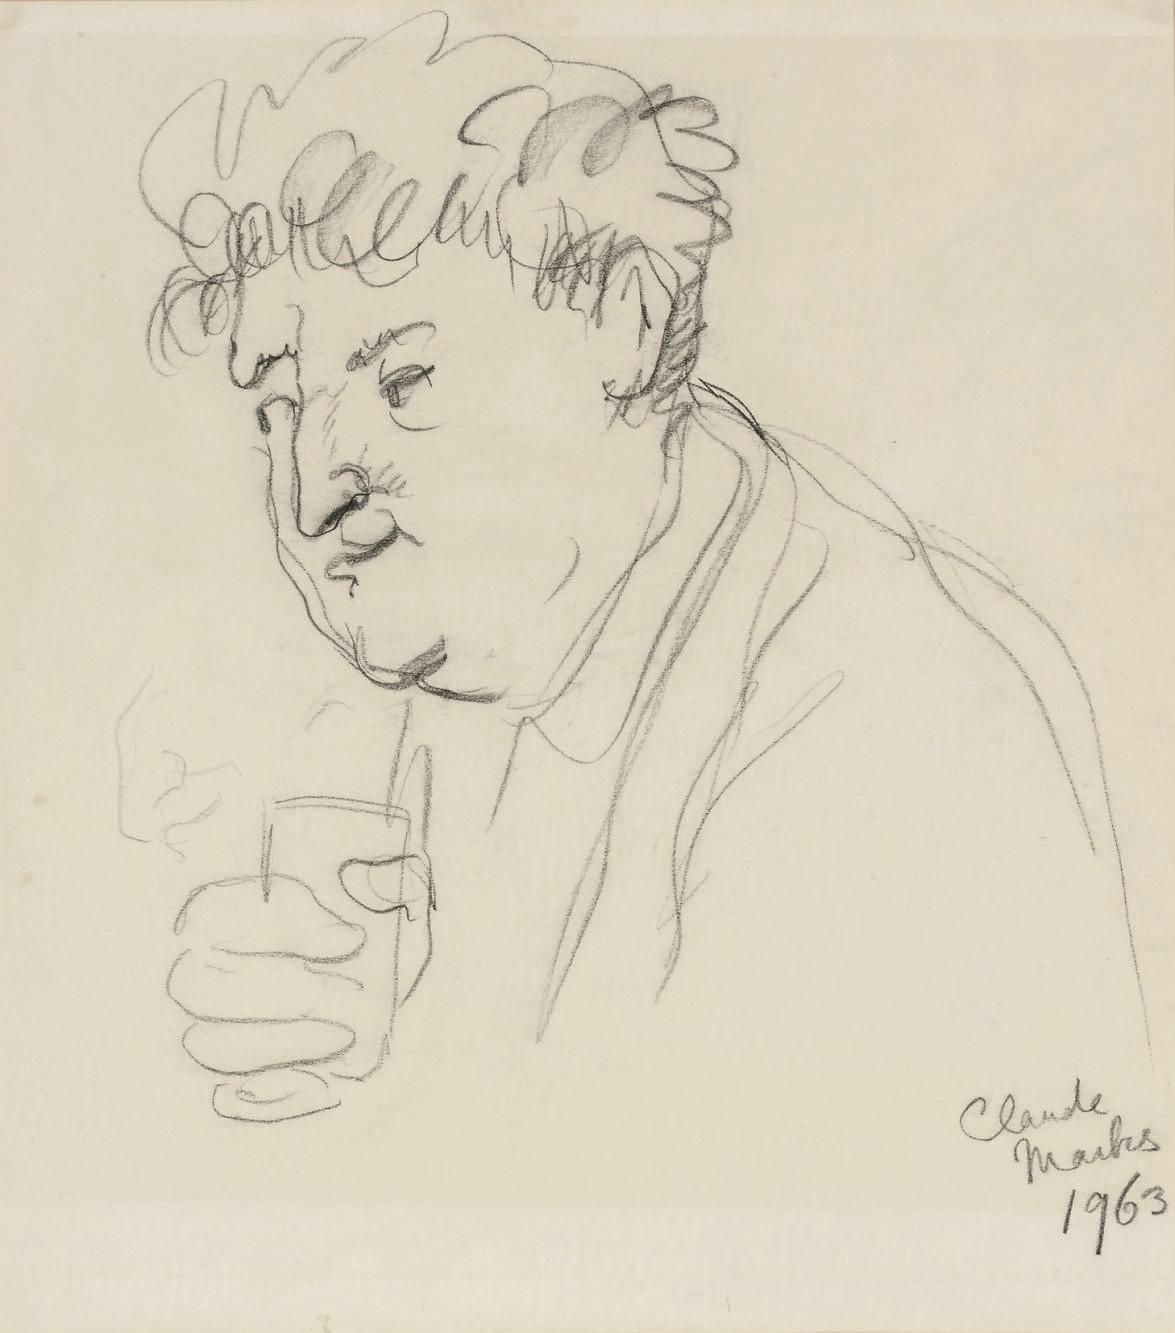 Claude Marks (1915-1991)